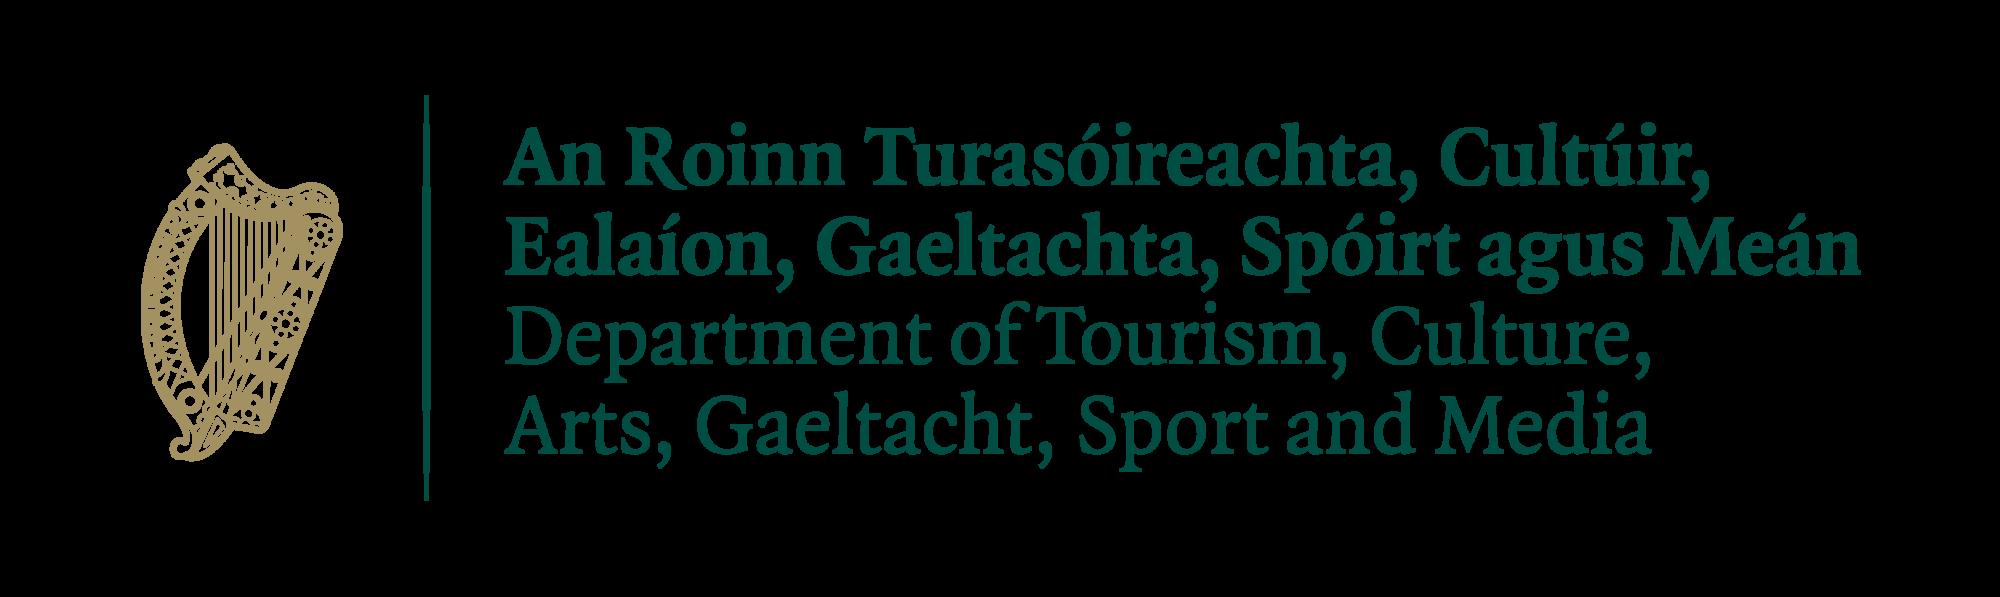 Department of Tourism, Culture, Arts, Gaeltacht, Sport & Media